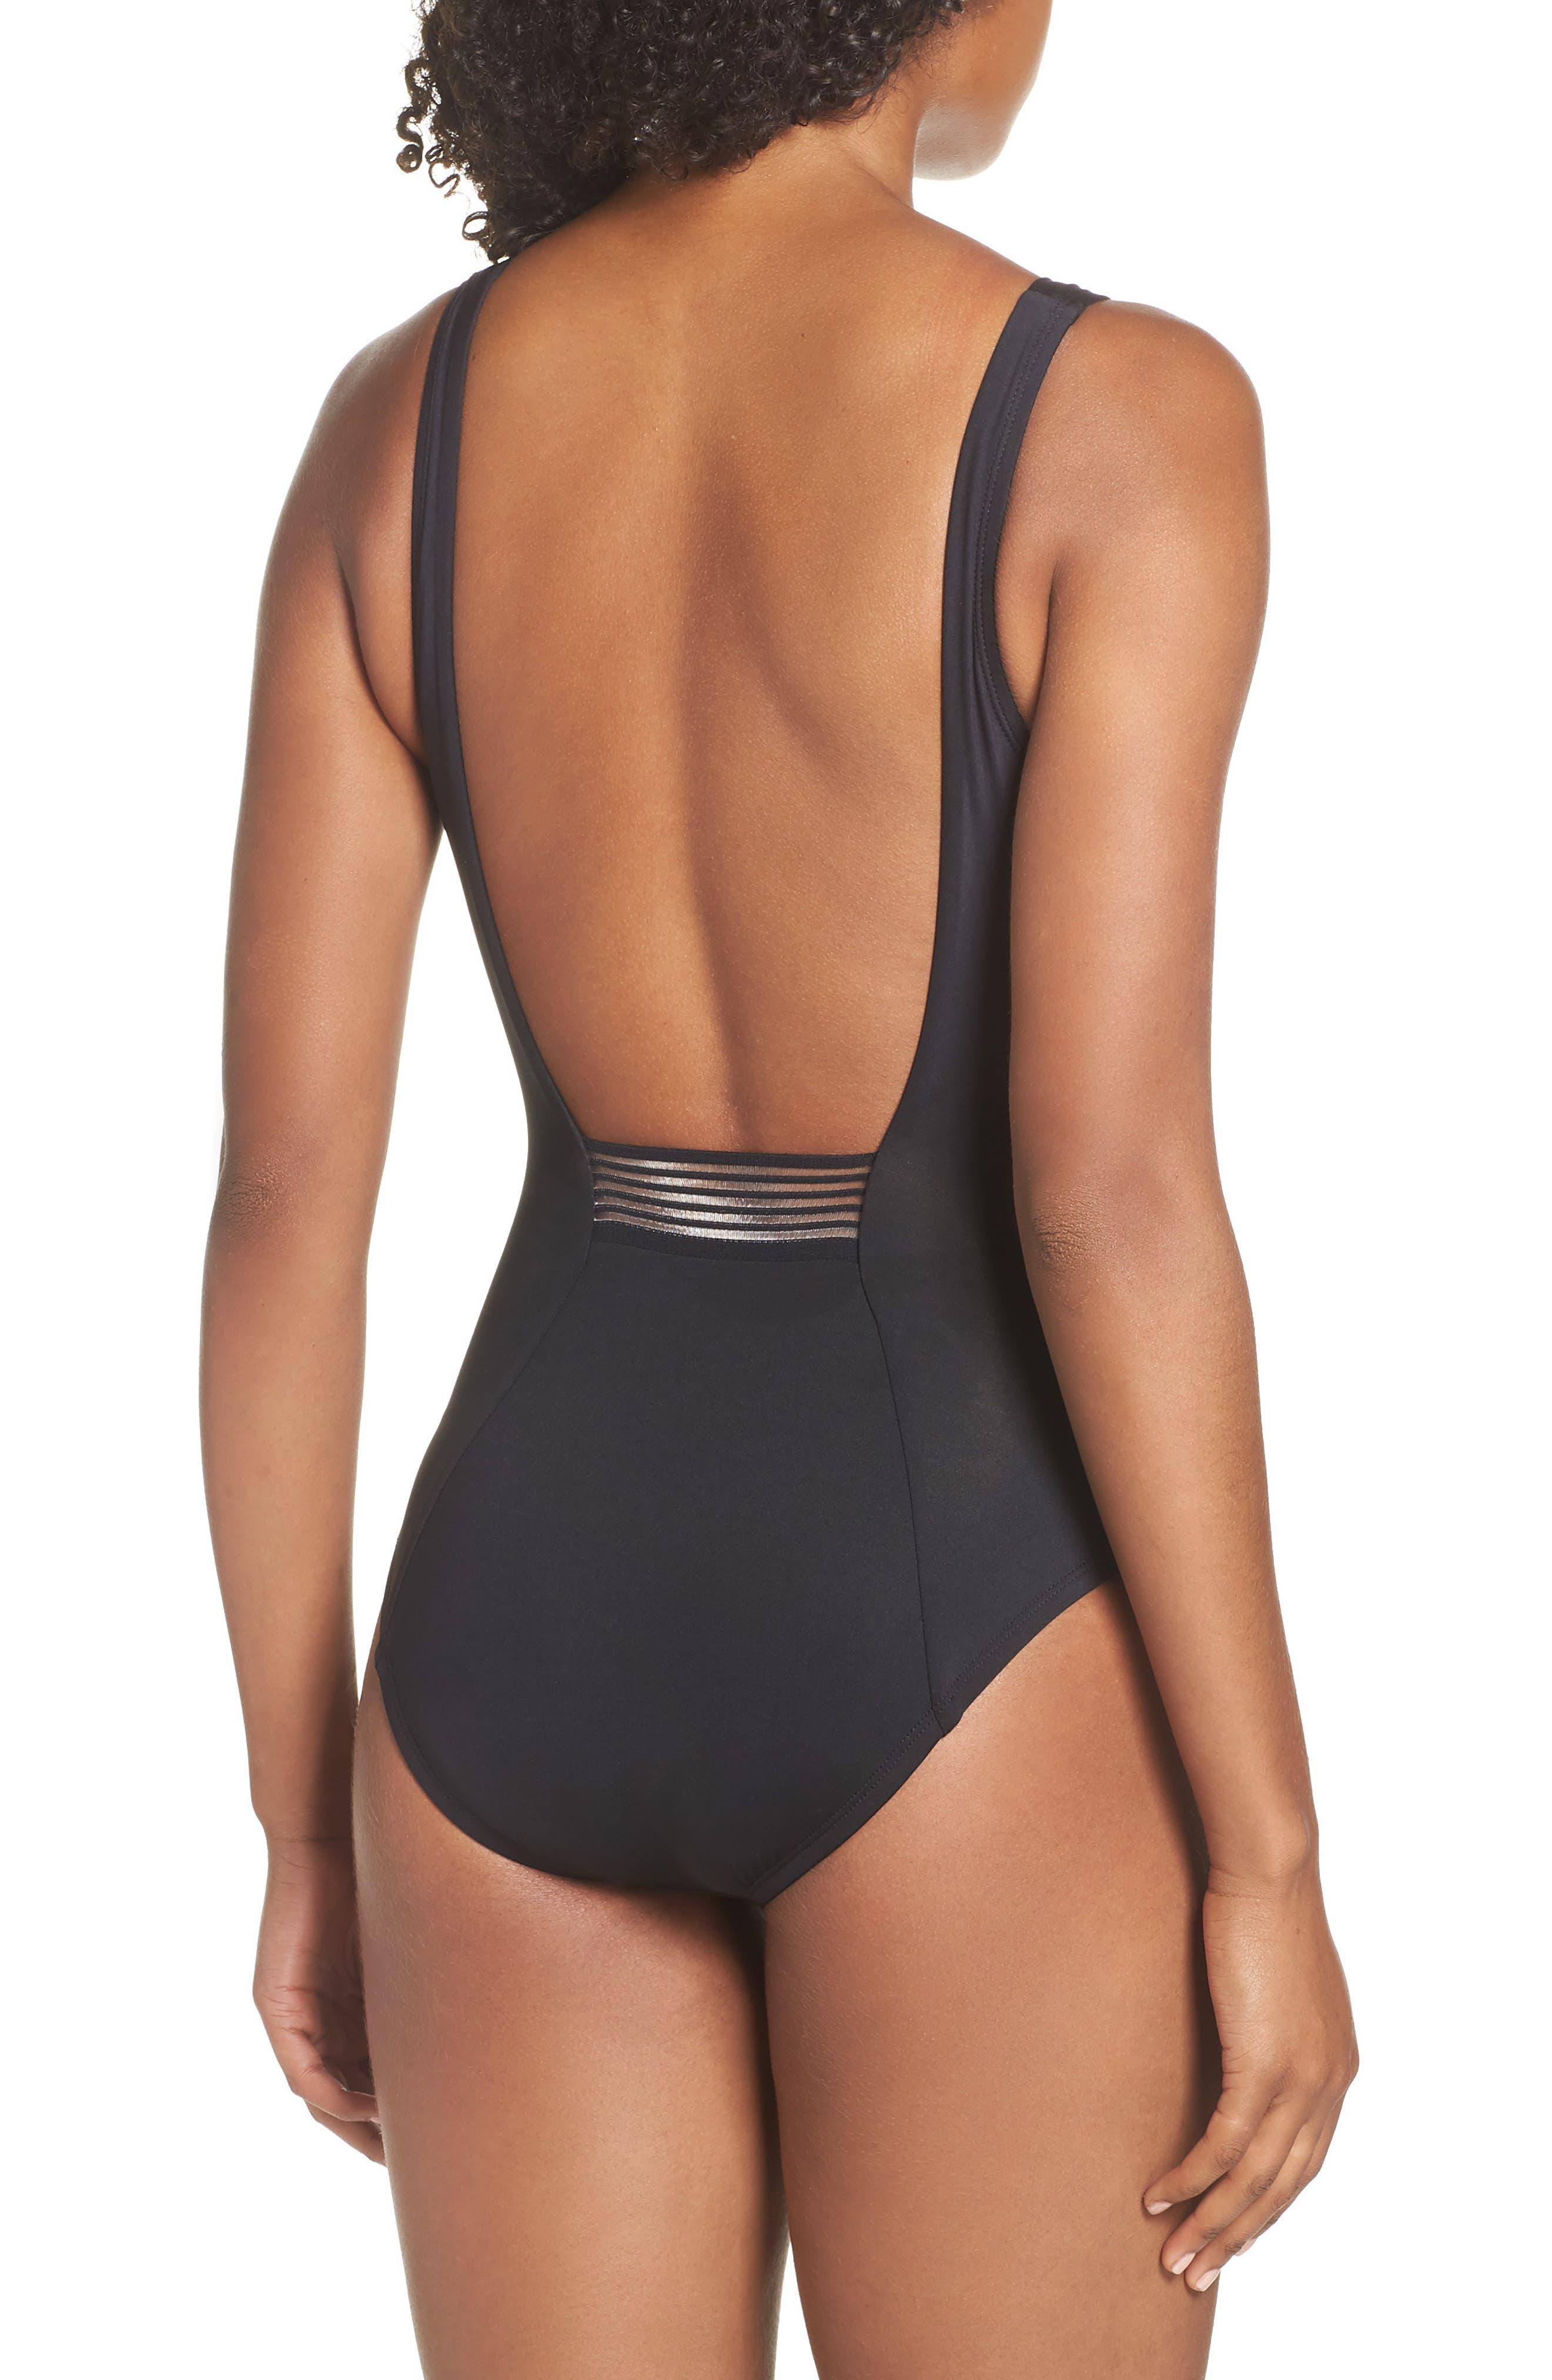 NIKE, U-Back One-Piece Swimsuit, Alternate thumbnail 2, color, BLACK